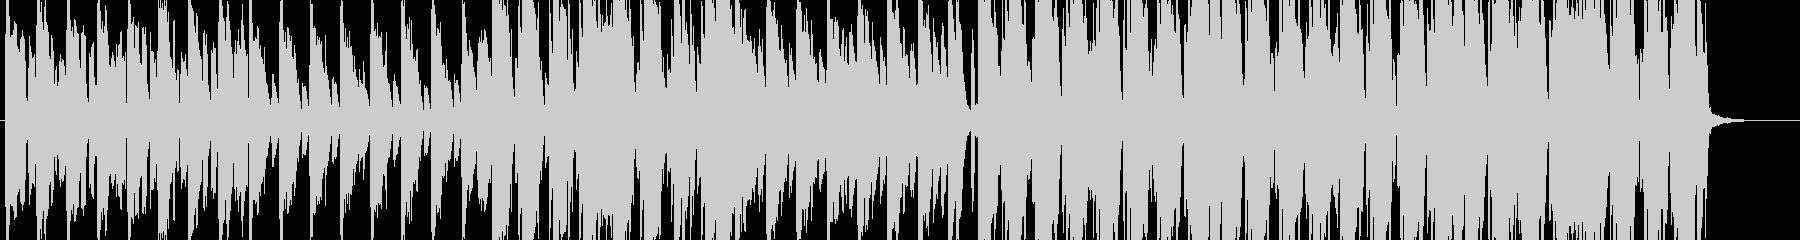 Kawaii×シャボン玉【主歌なし】の未再生の波形